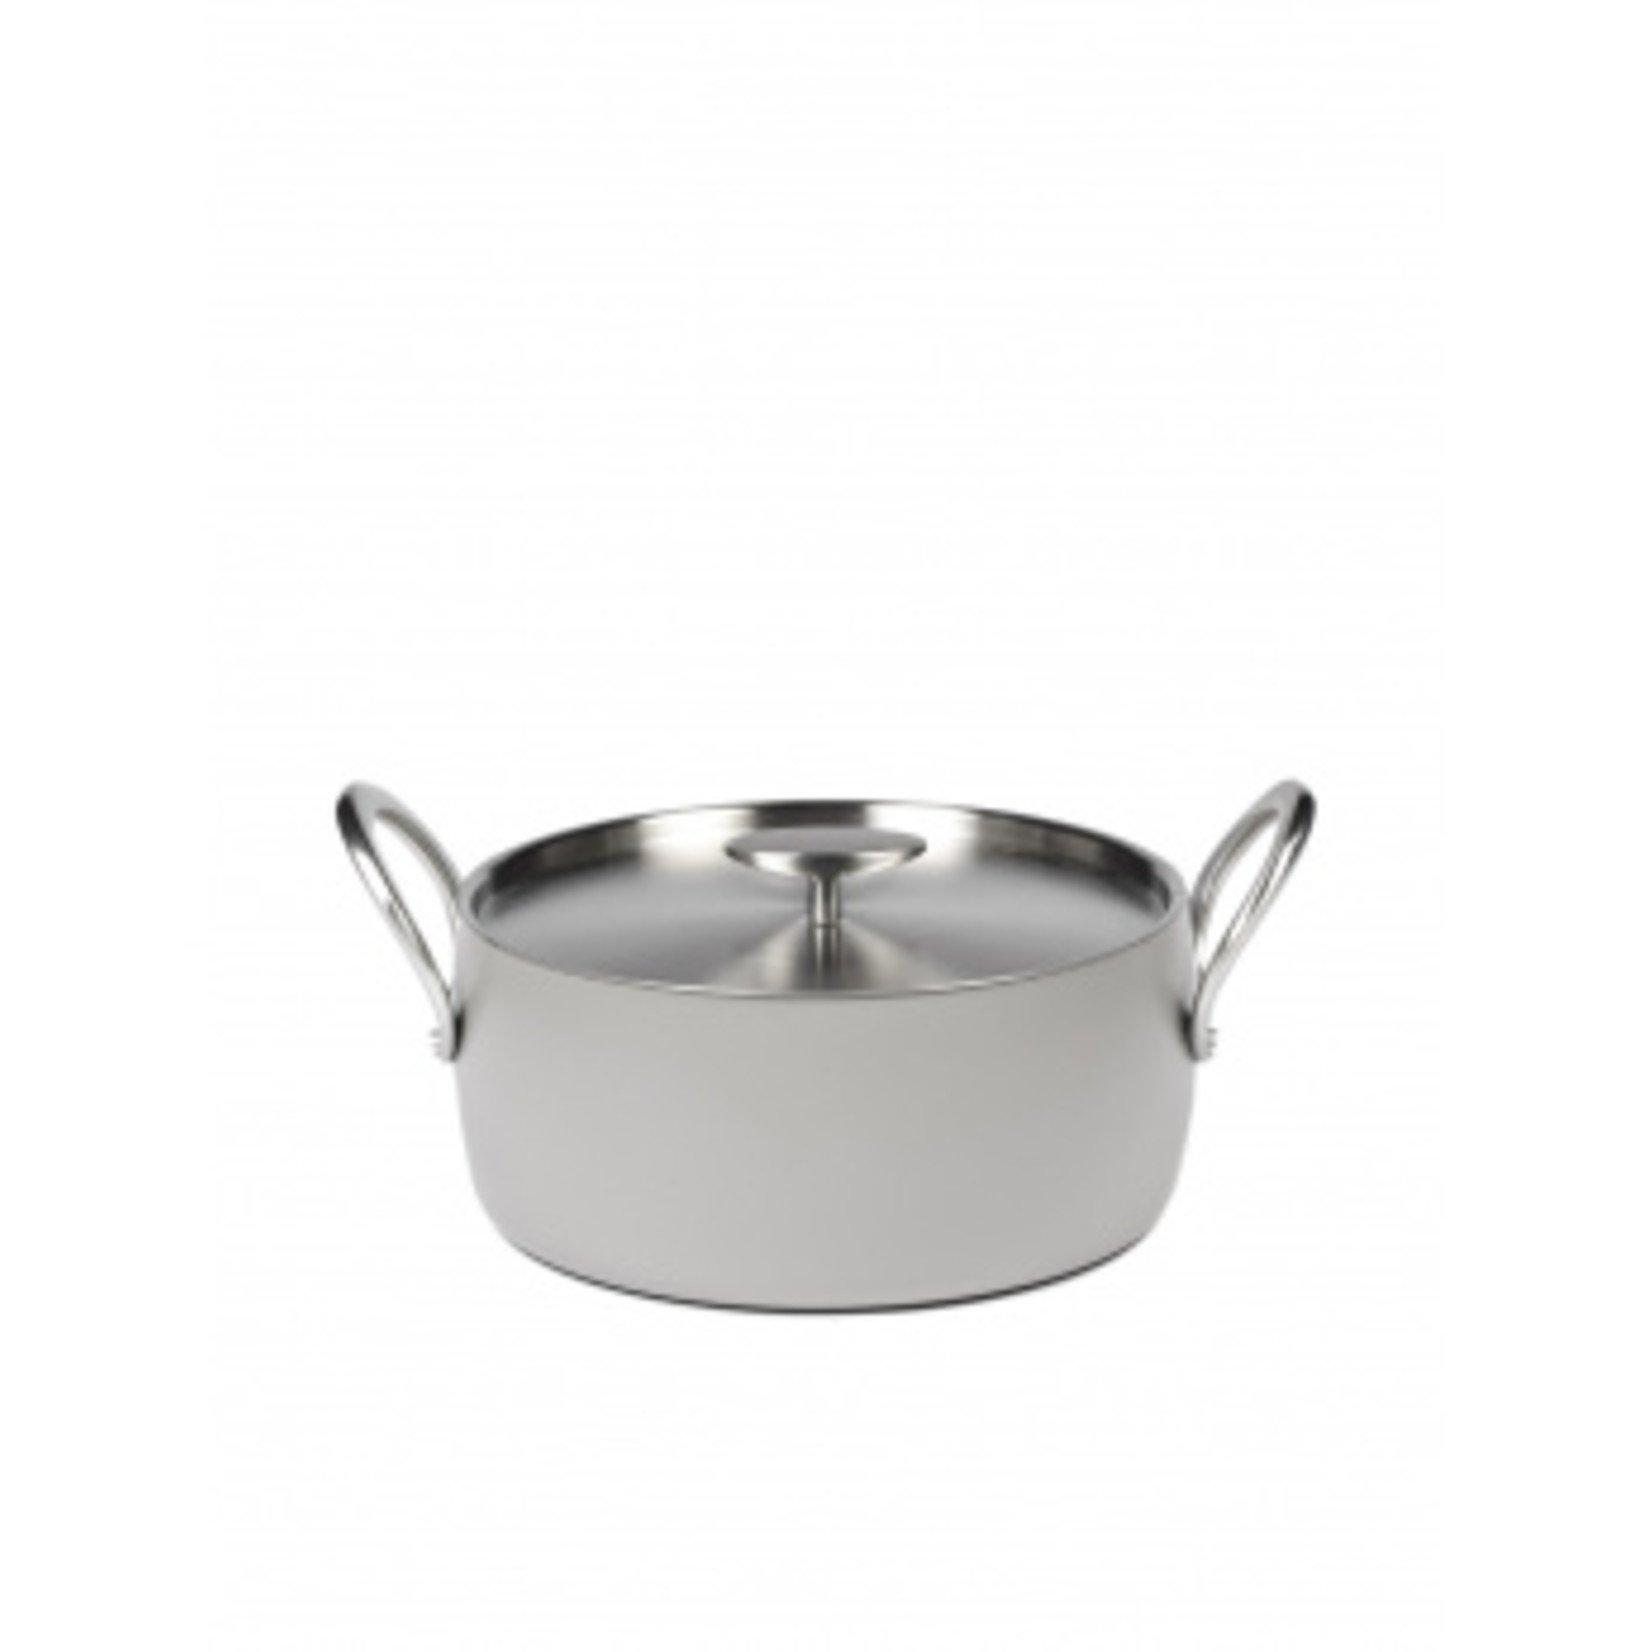 Pascale Naessens collection Pure Anti-kleef kookpot Aluminium 5 l